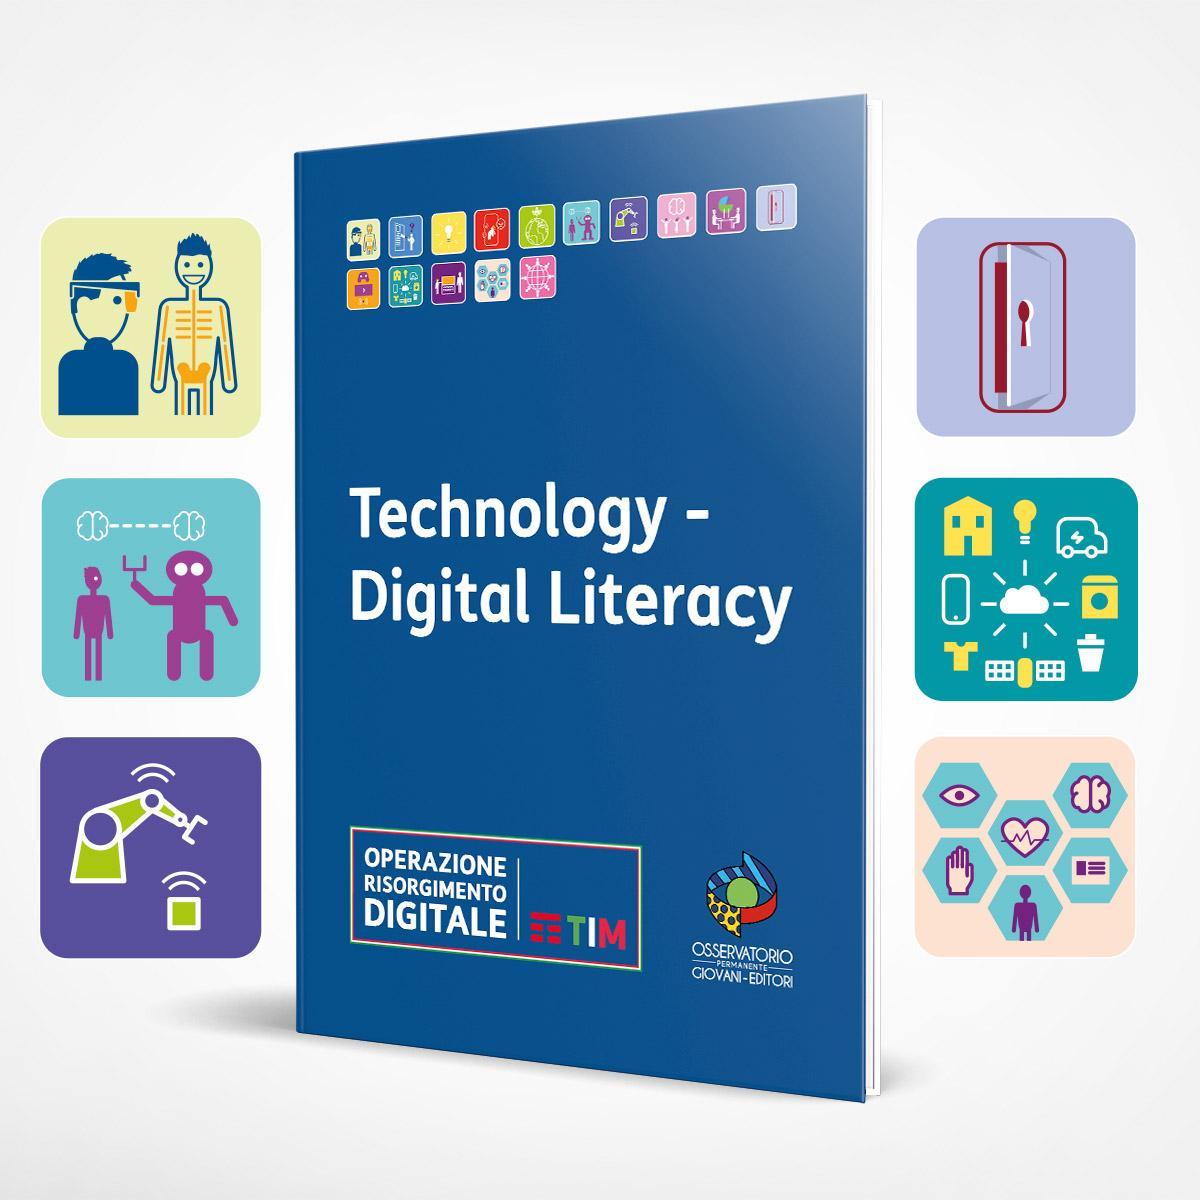 TIM Technology – Digital Literacy